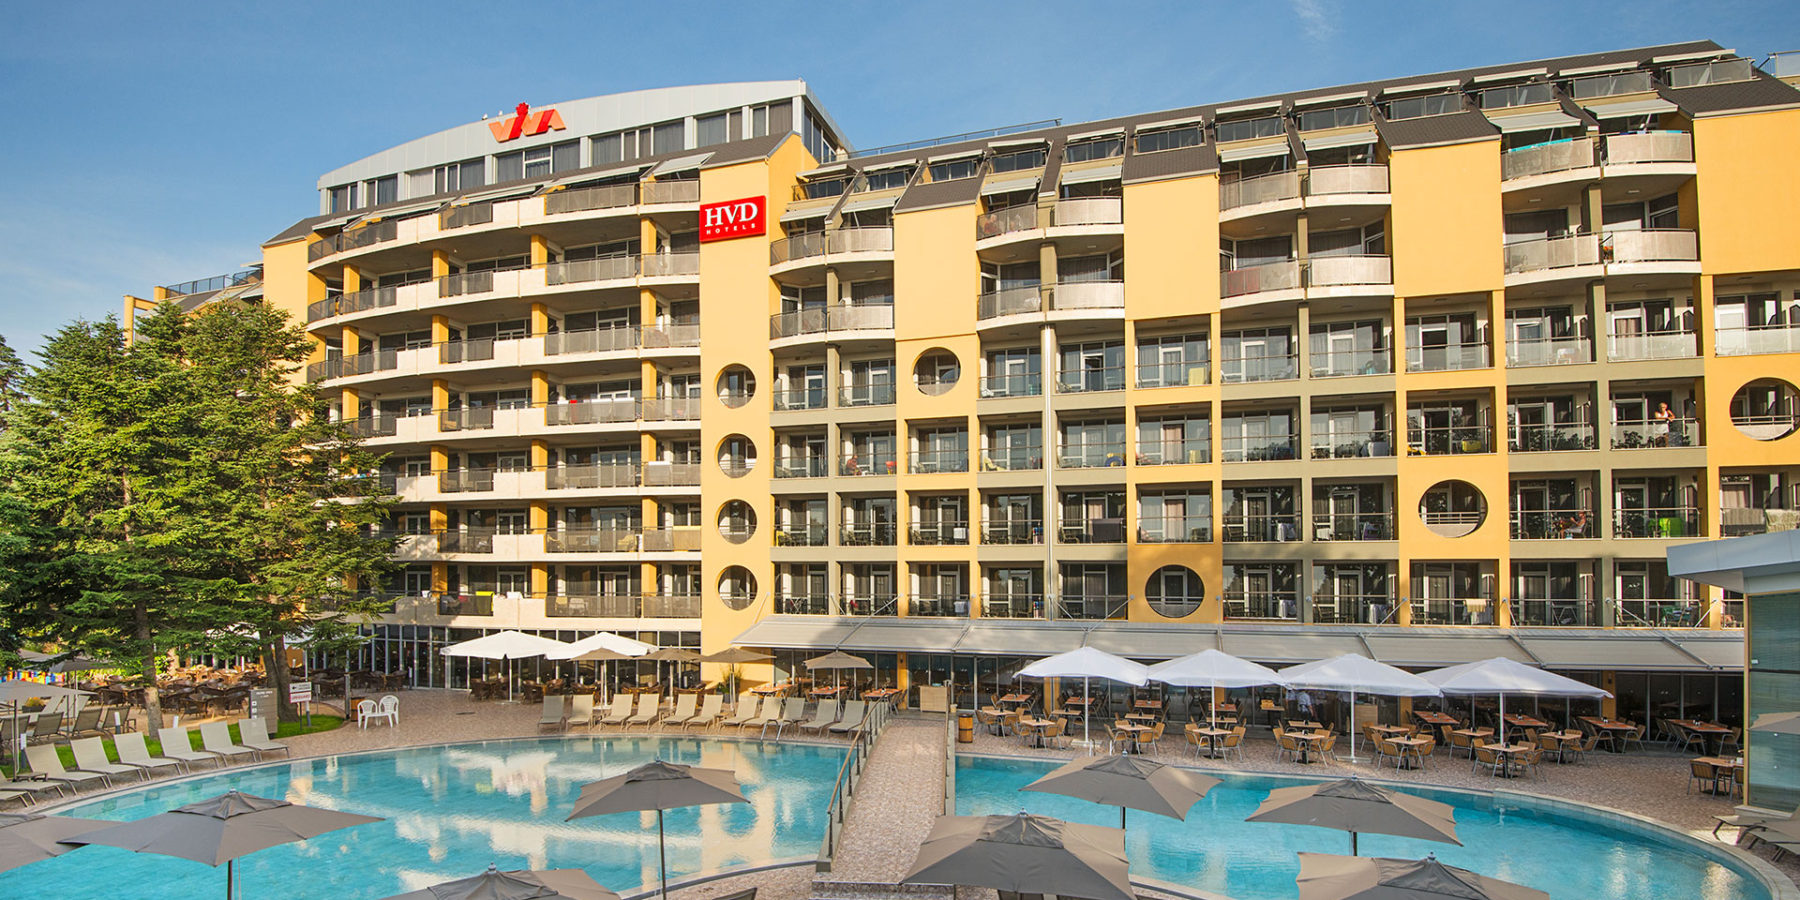 The Resort HVD Viva Club Hotel